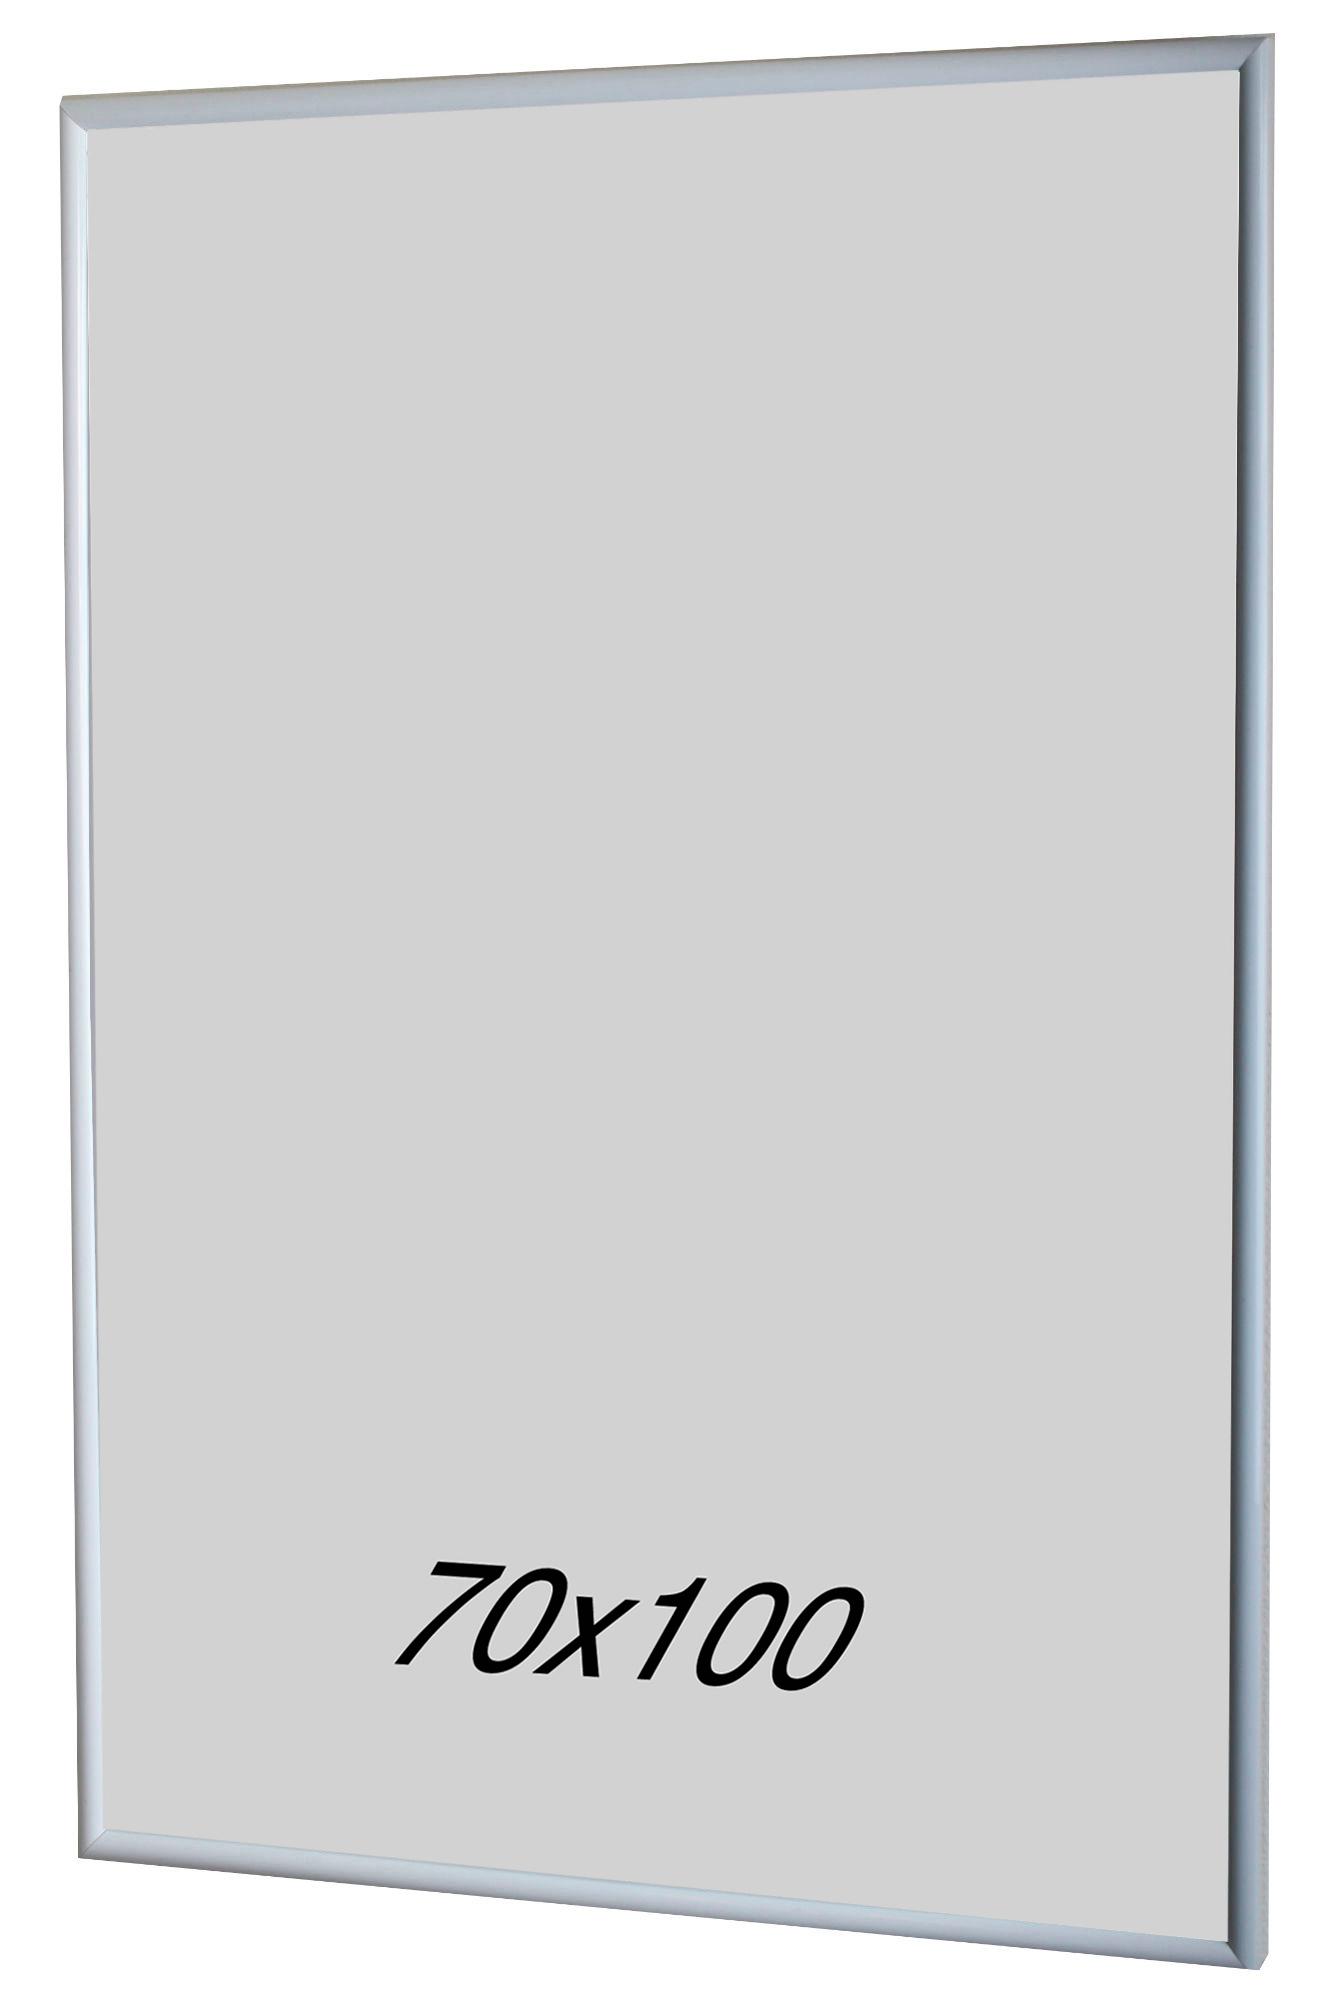 Victoria-kehys 70x100 cm